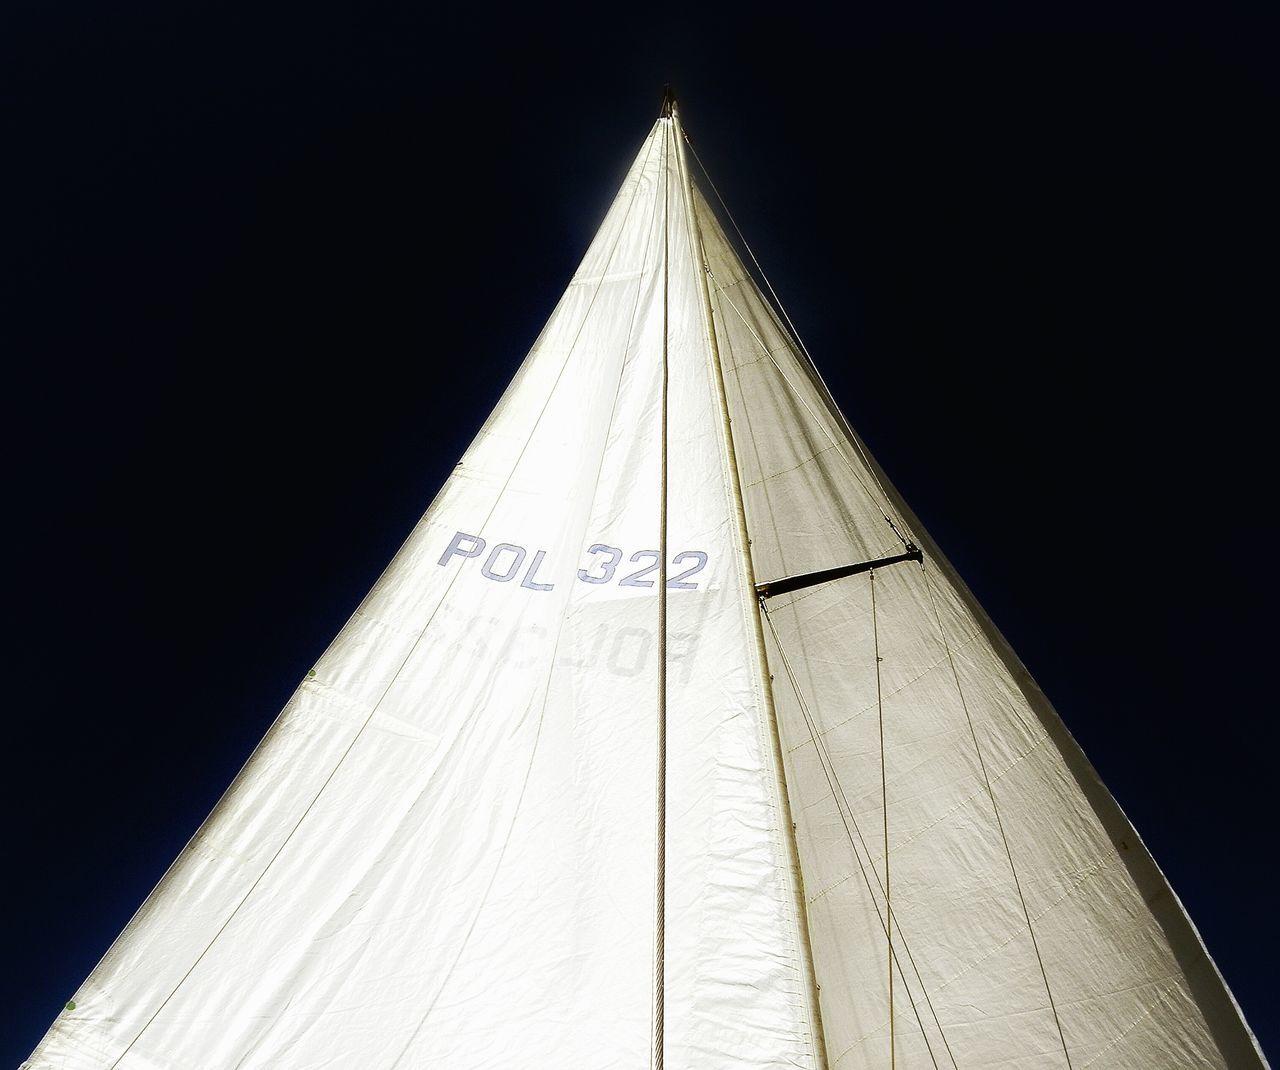 Yaht Jacht Sailing żeglowanie Relaxing Enjoying Life On Board Na Pokładzie żagiel Sail Minimal